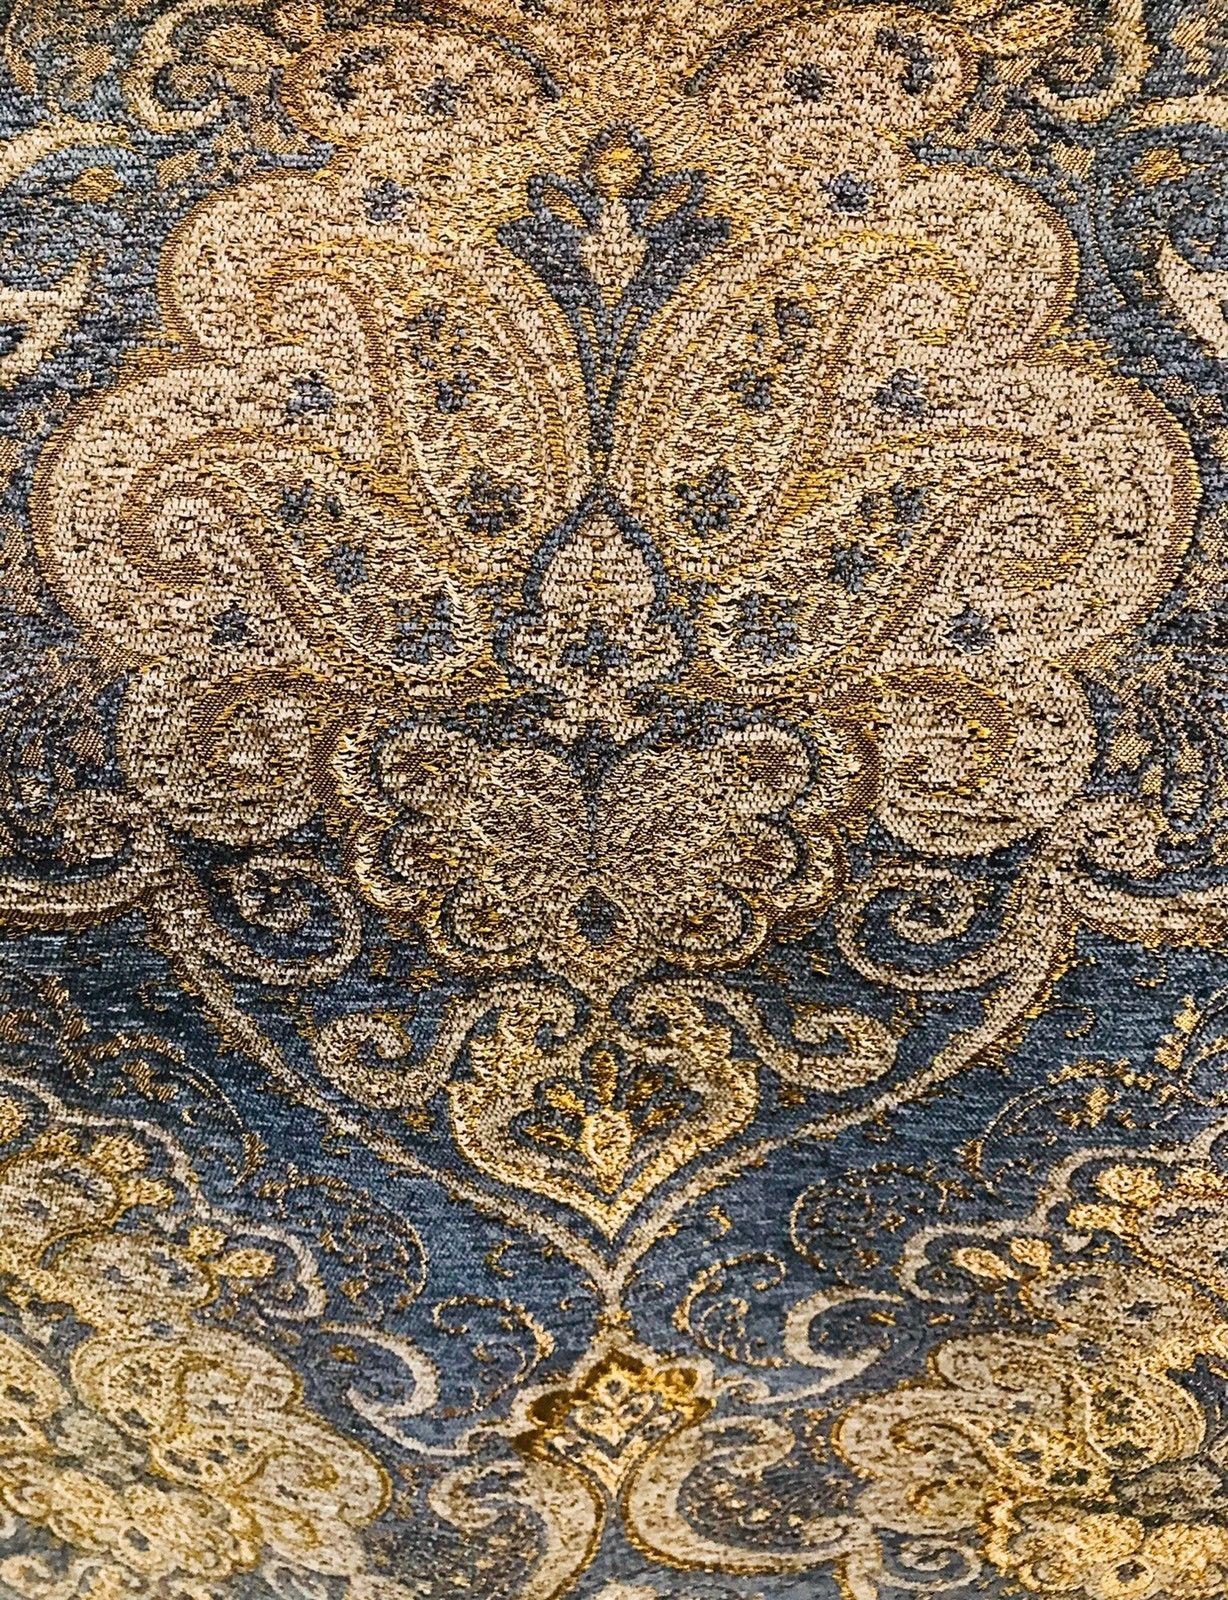 Swatch Antique Inspired French Brocade Chenille Velvet